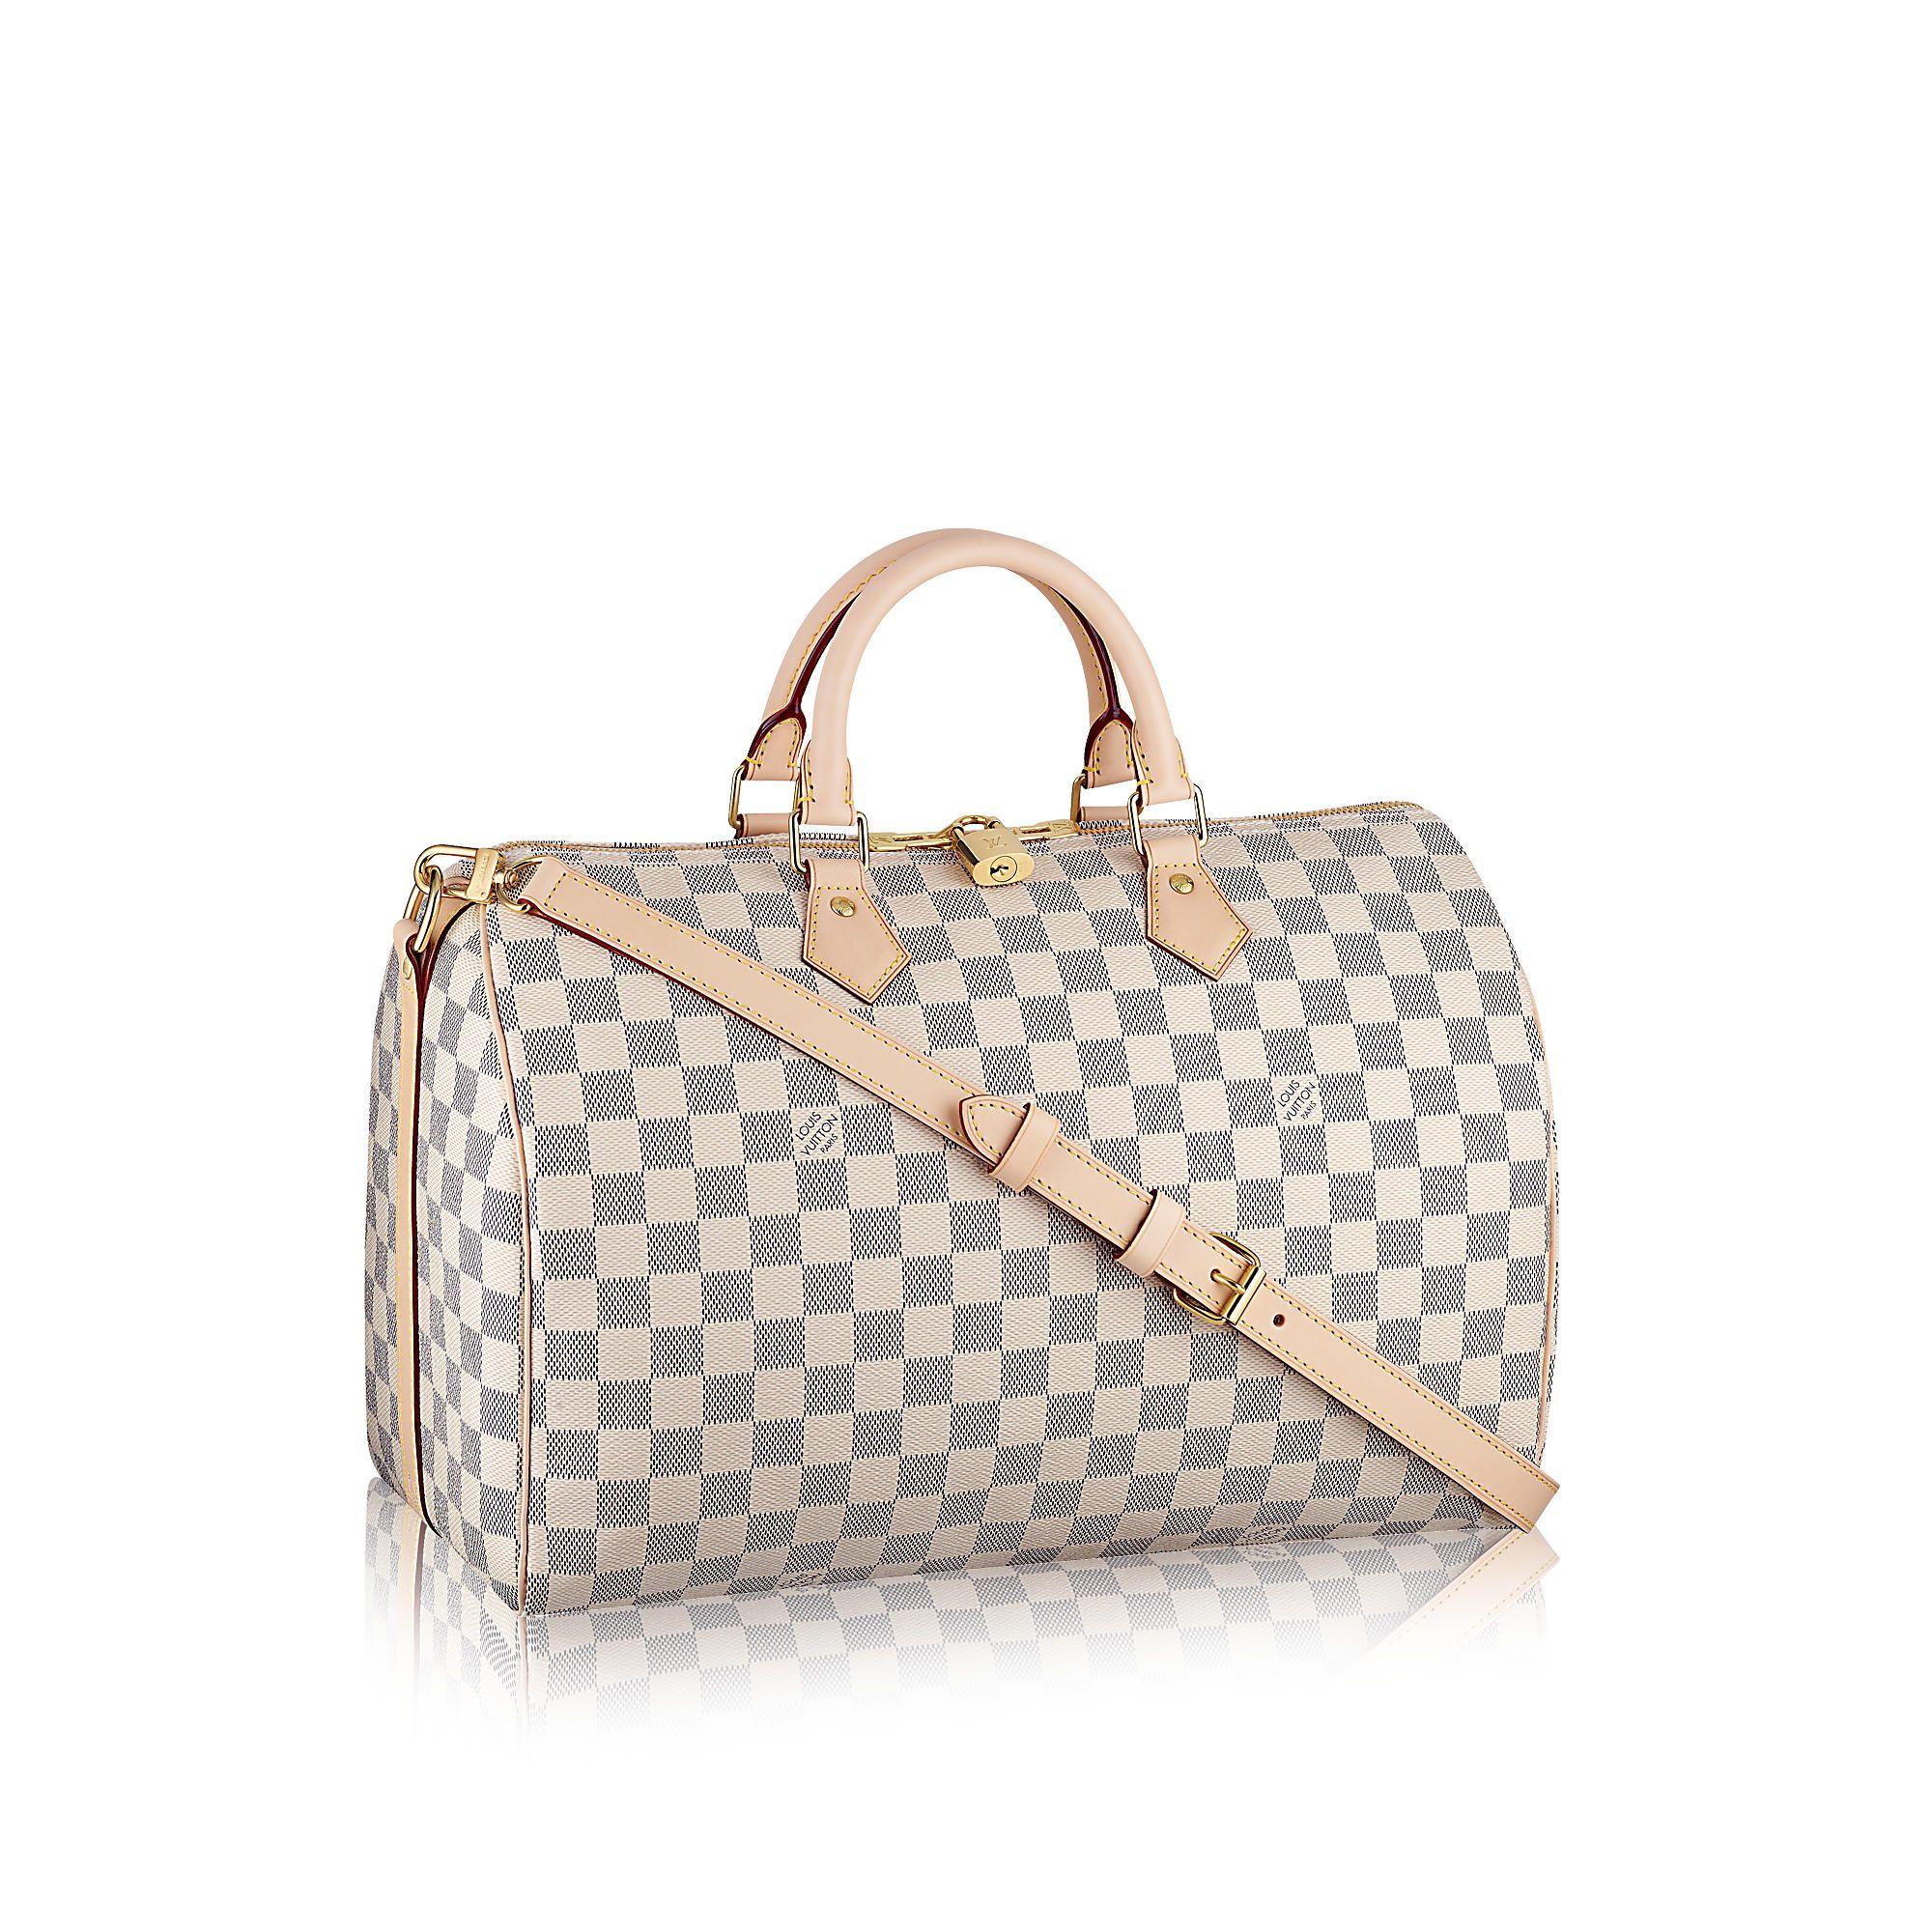 cc5b54ae09c Discover Louis Vuitton Speedy Bandoulière 35 via Louis Vuitton ...